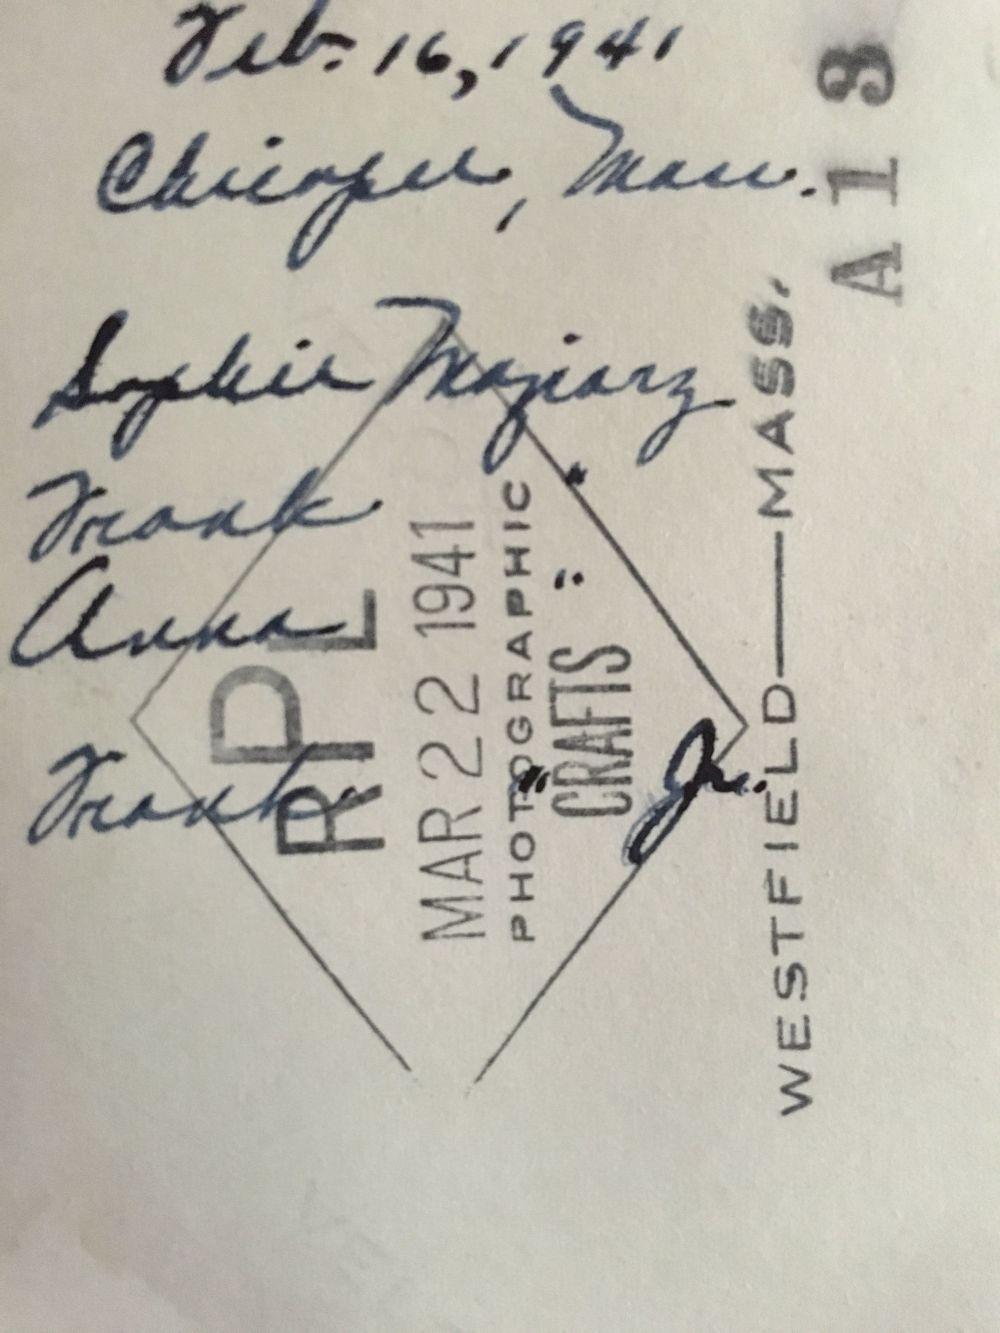 feb 16 1941 b